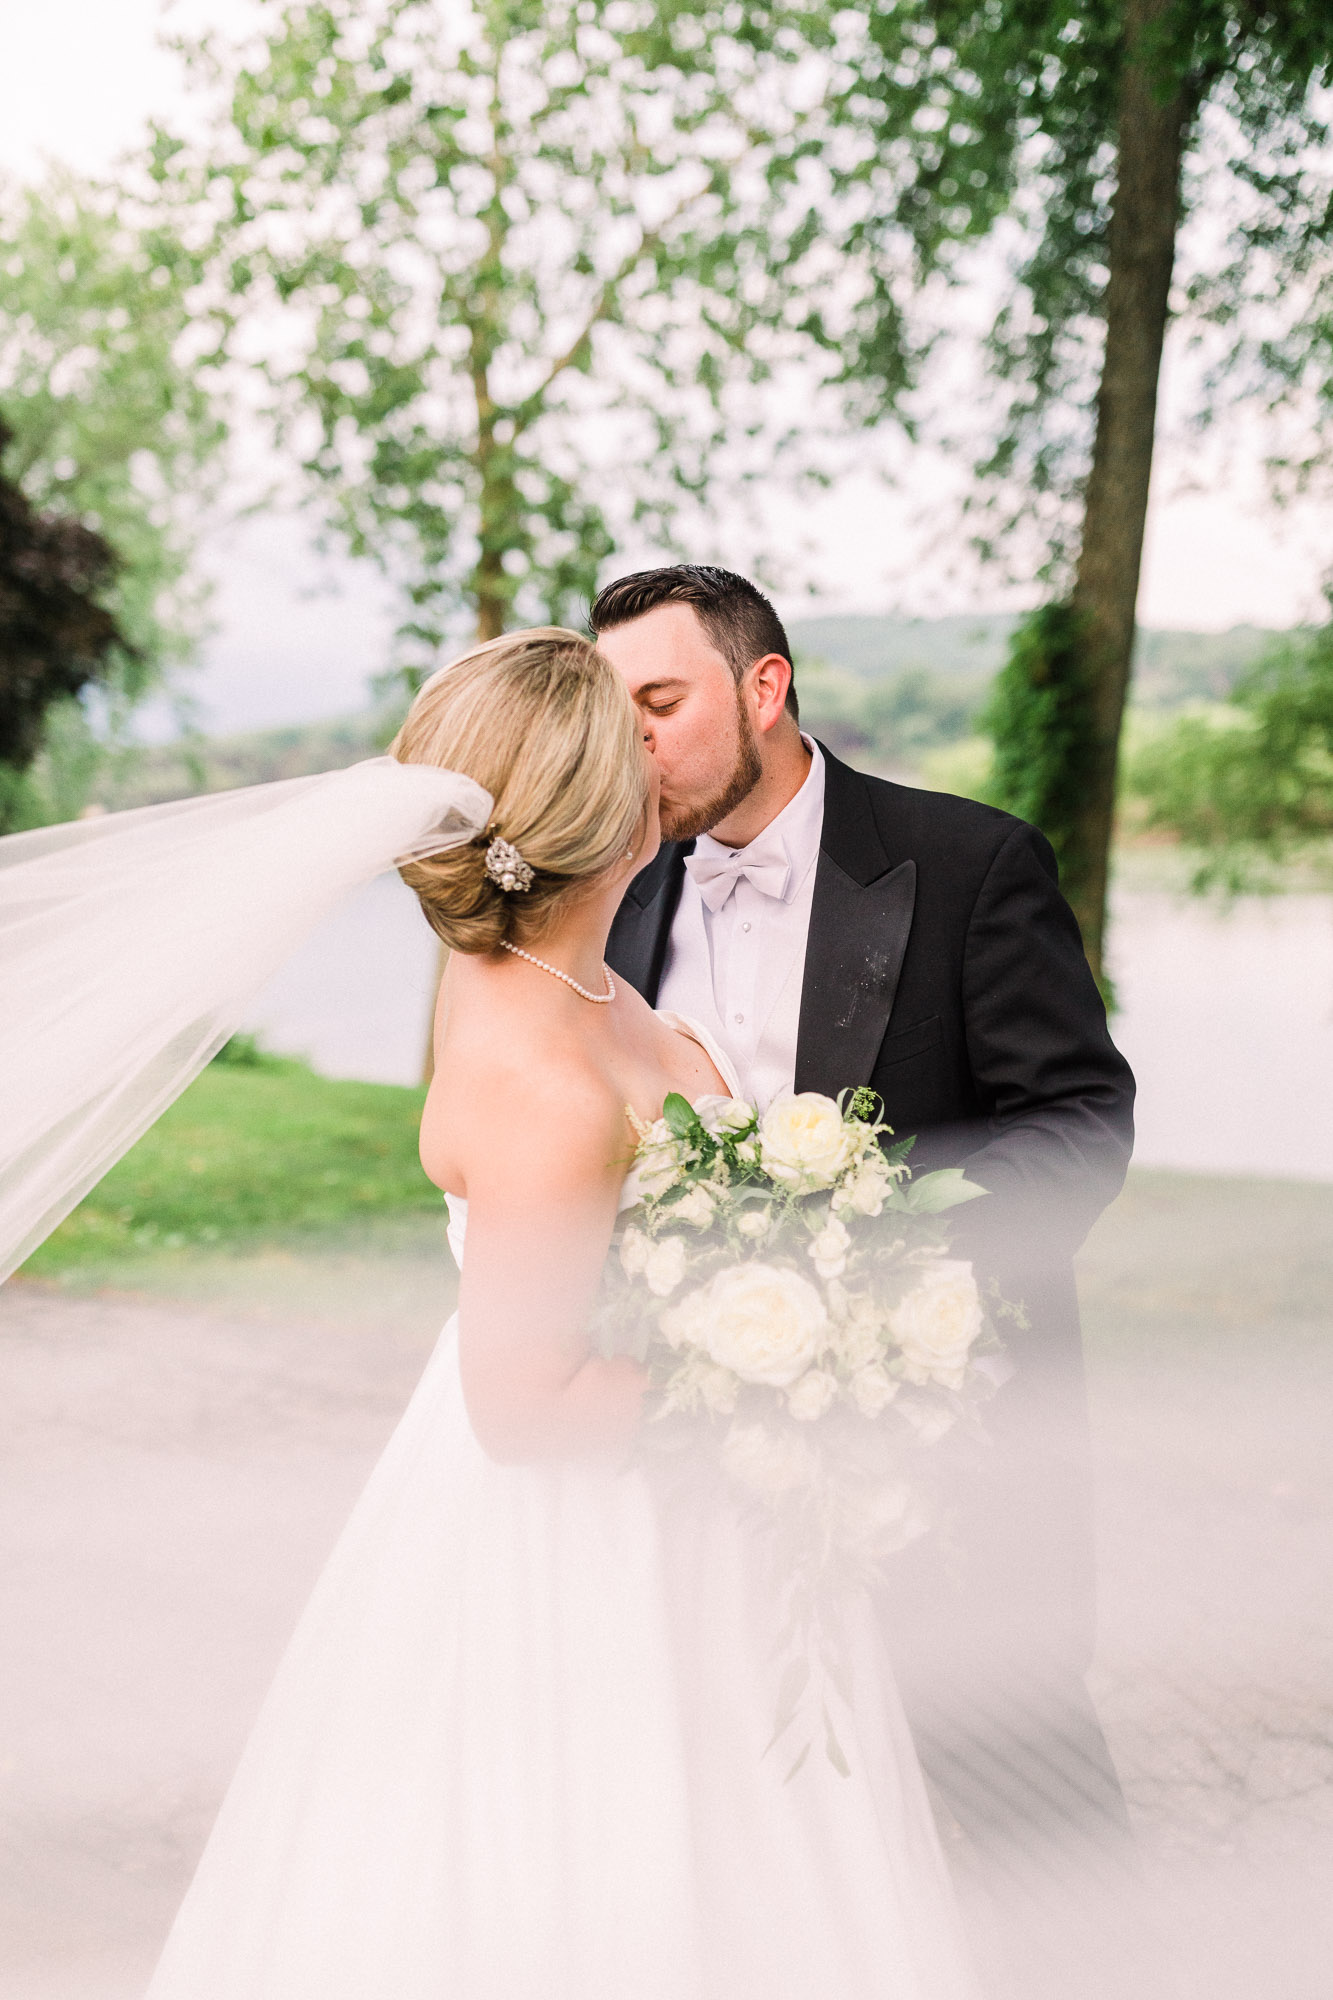 isle-of-que-wedding-6920.jpg